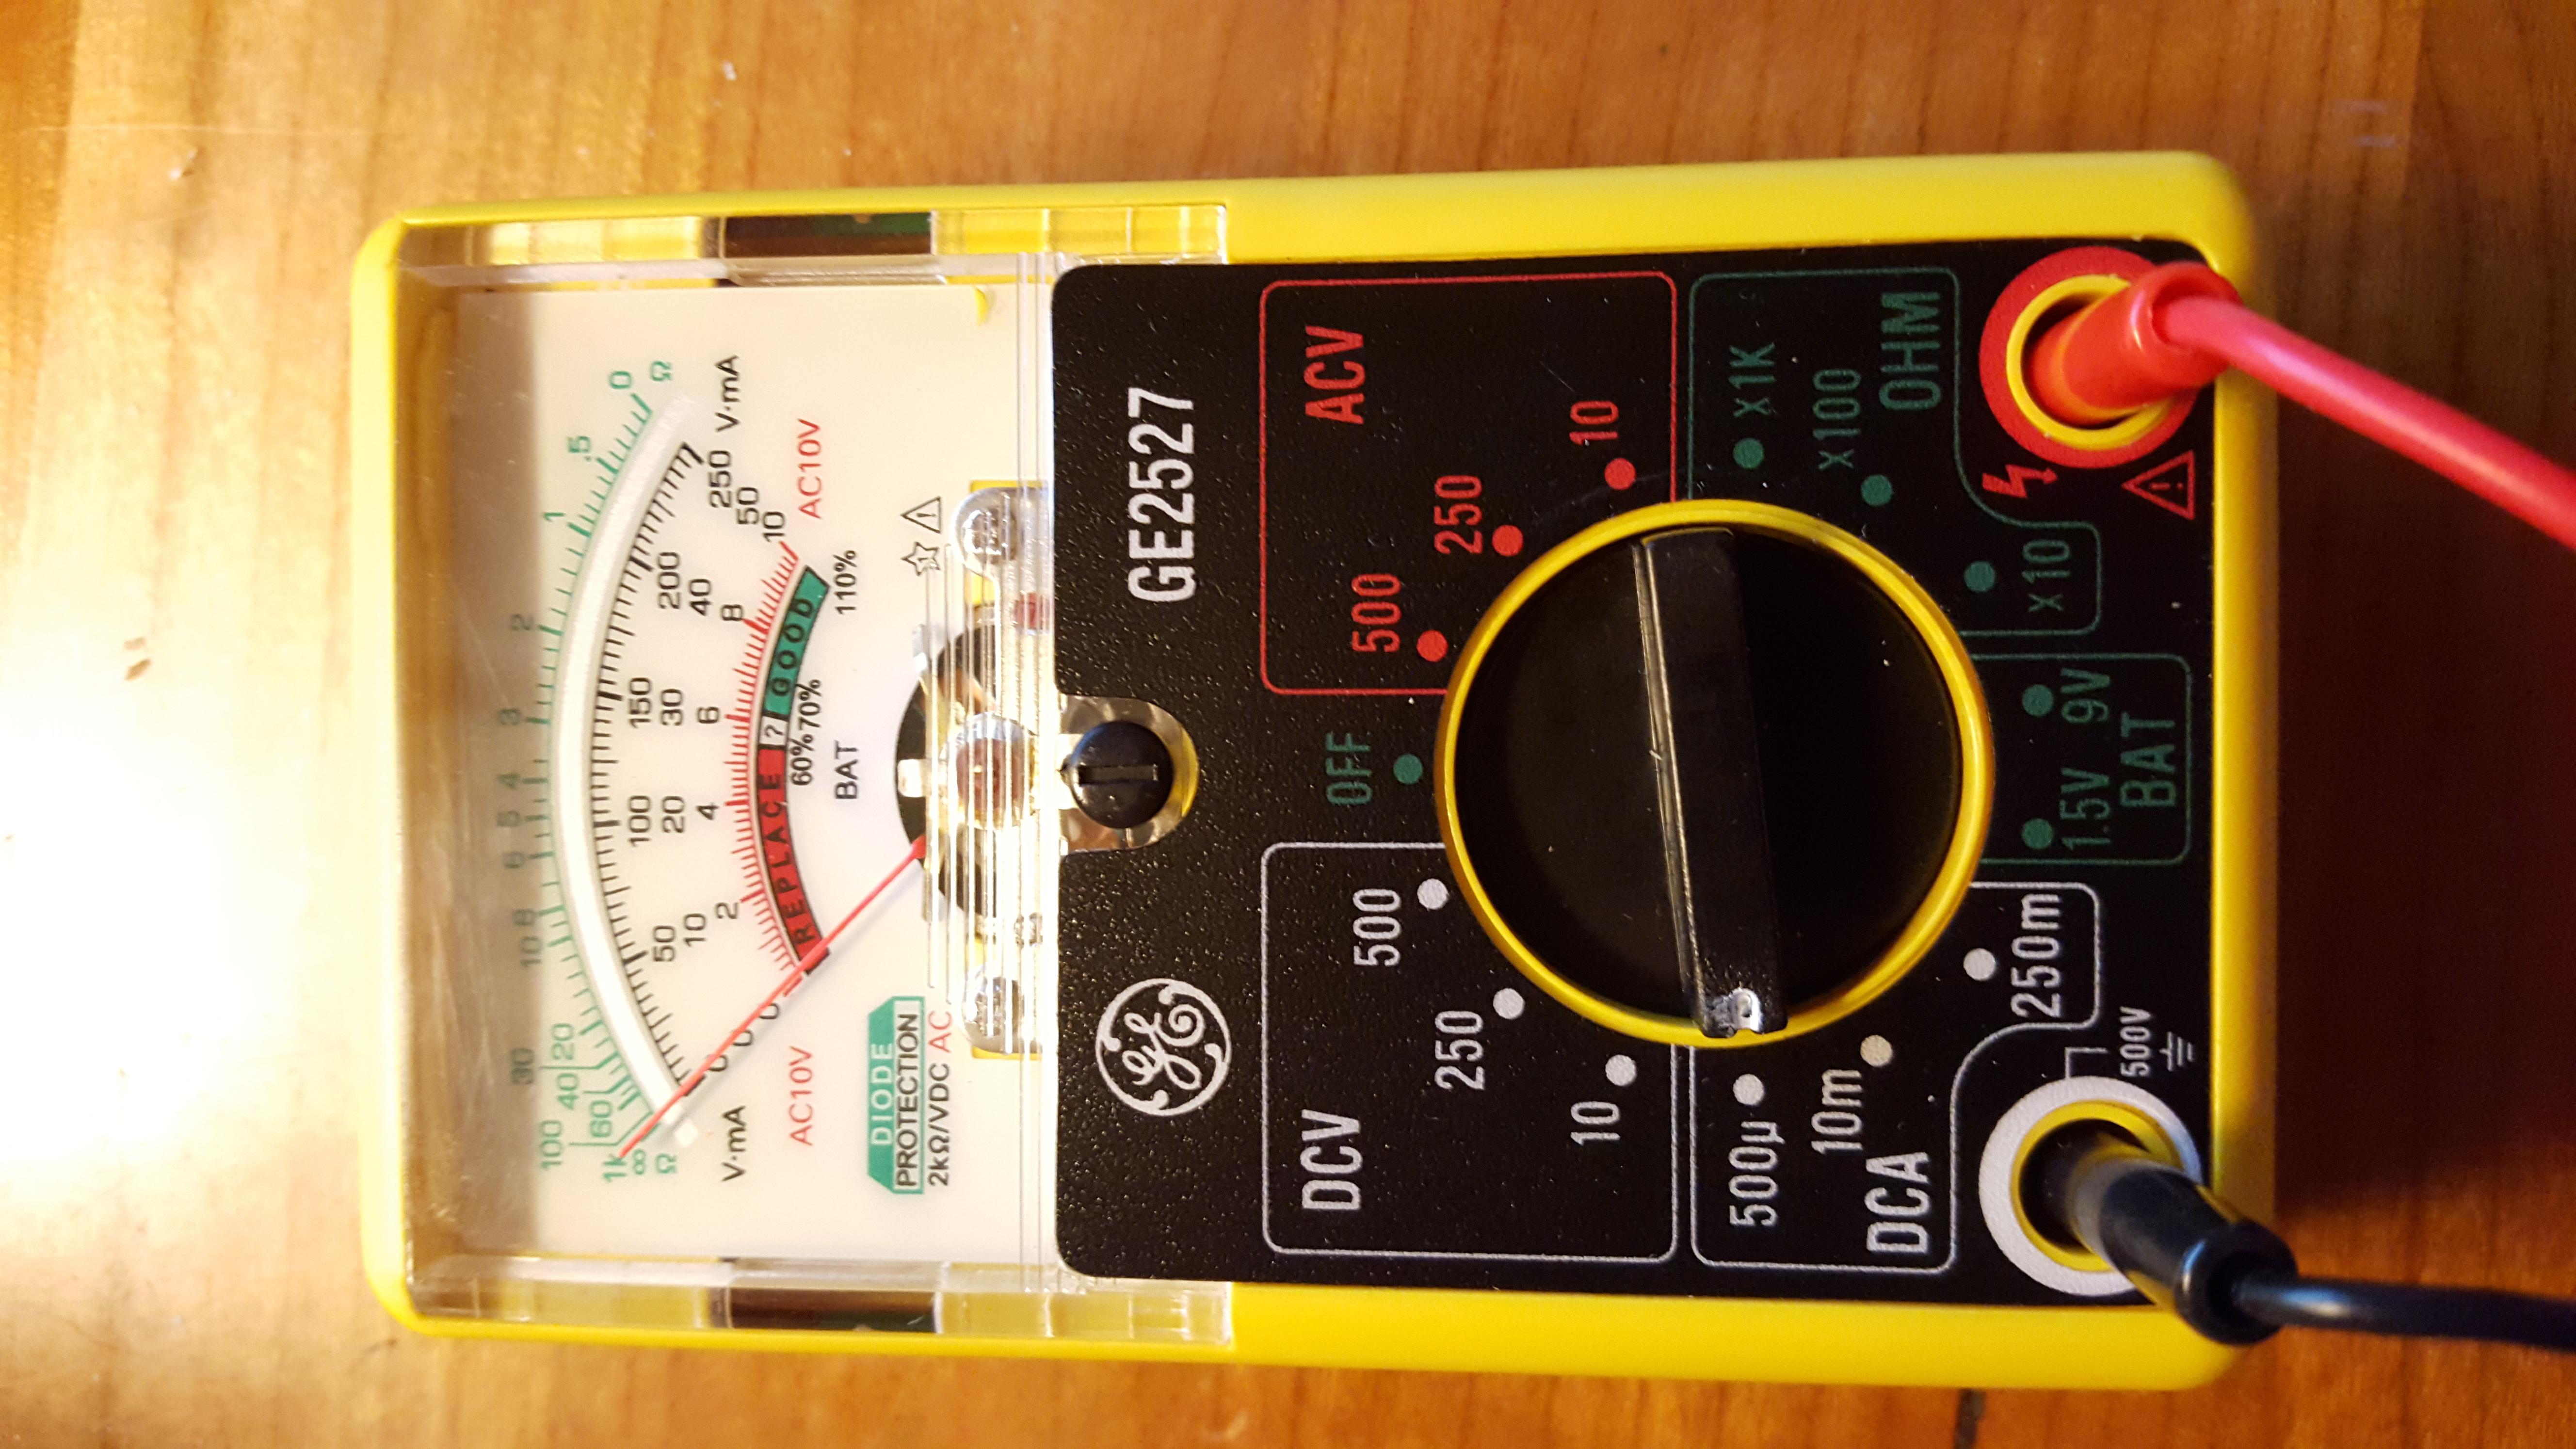 I have a Rheem heat pump  I have three zones configured  The